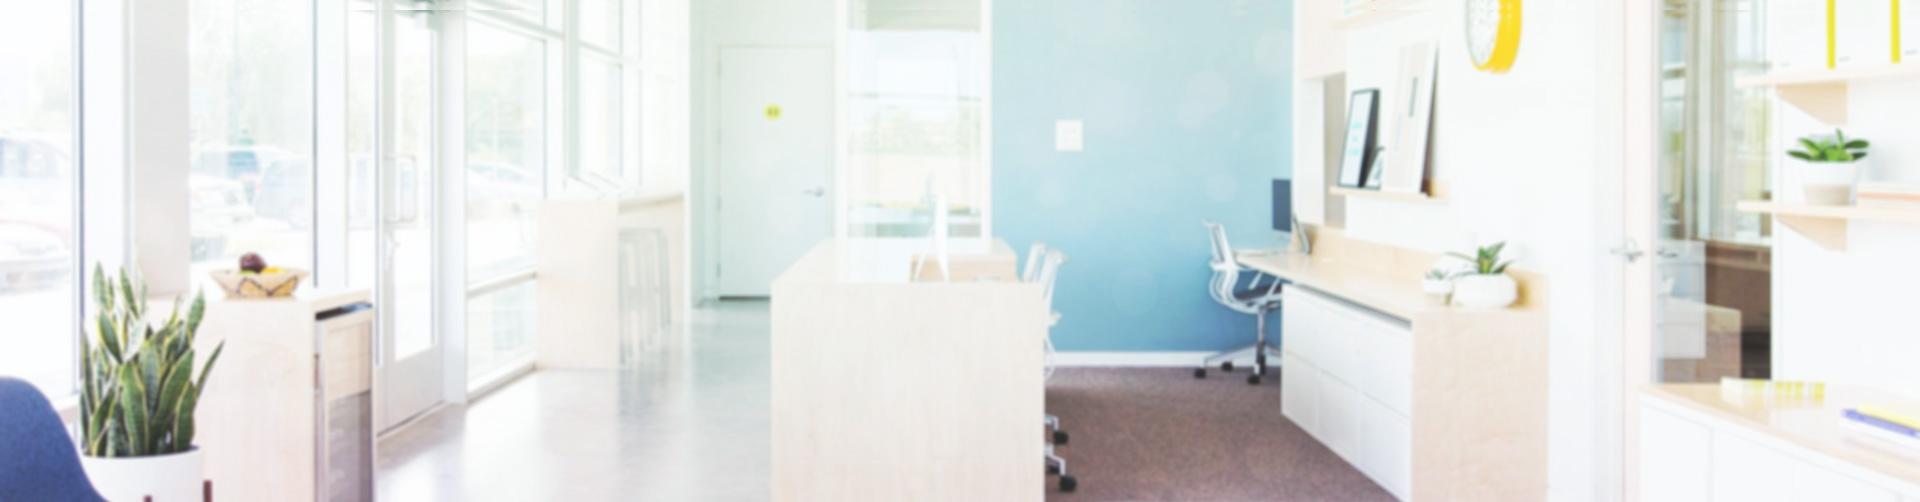 MD TruCare – Board-certified psychiatrist and a sleep